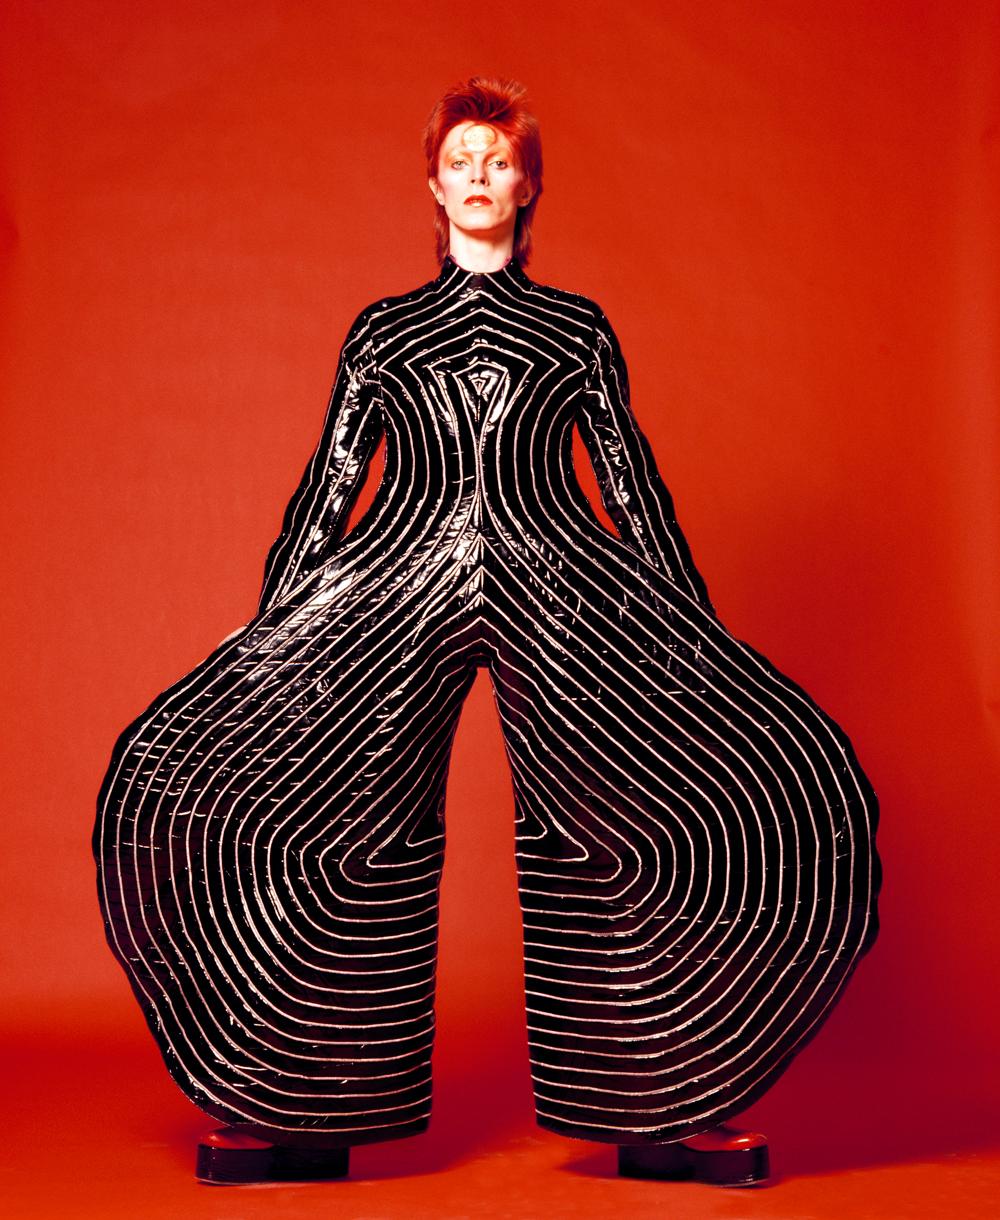 Striped-bodysuit-for-Aladdin-Sane-tour-1973.jpg